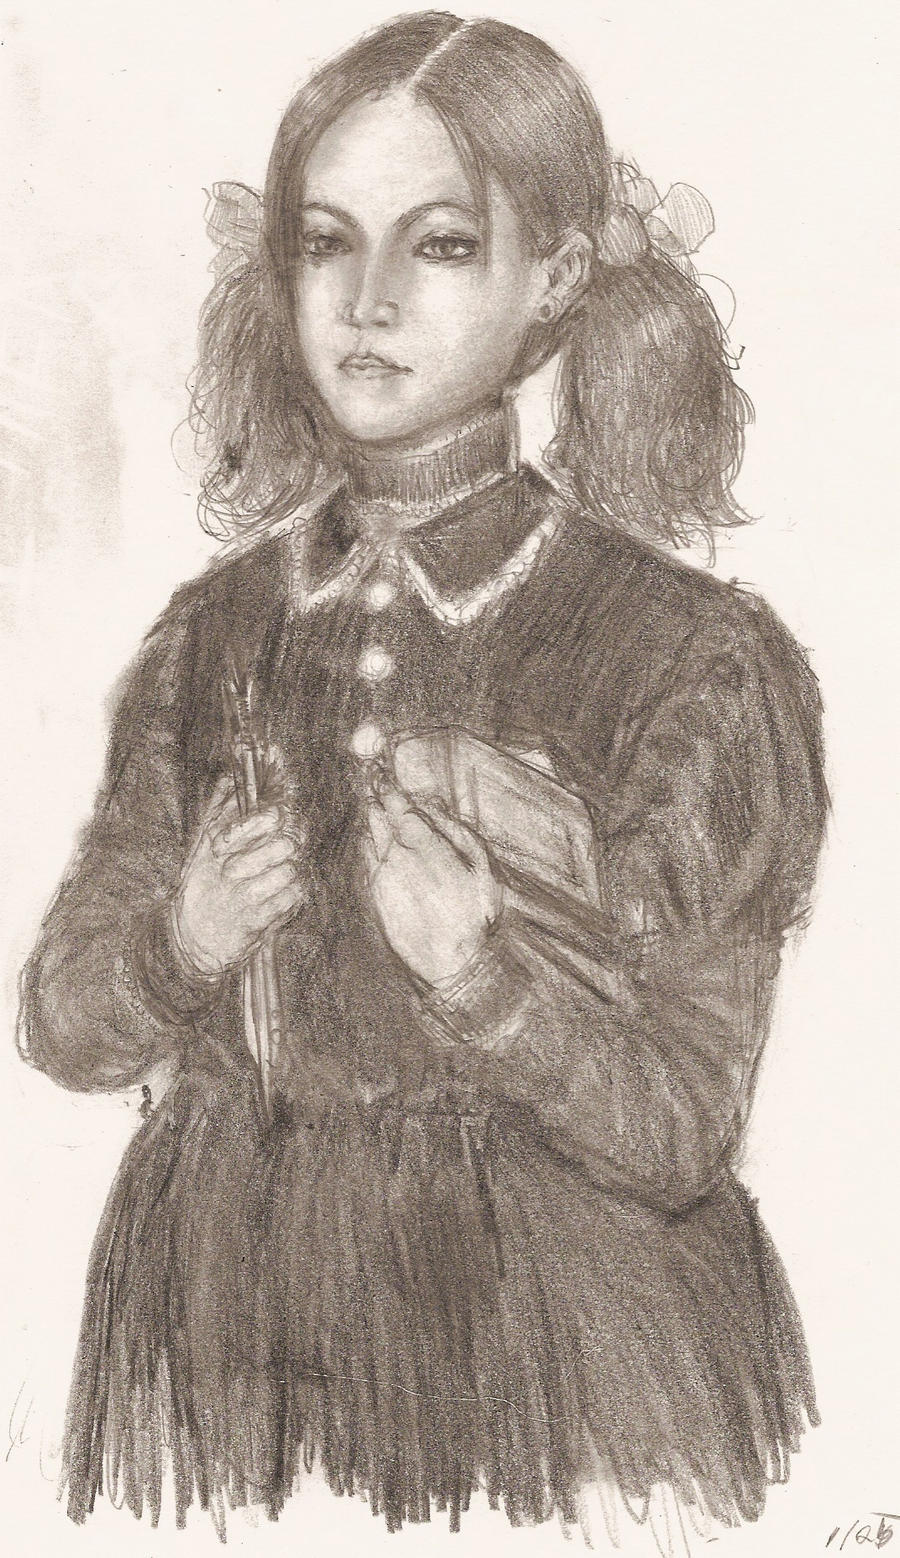 esther the orphan by benevolent-angel94 on DeviantArt